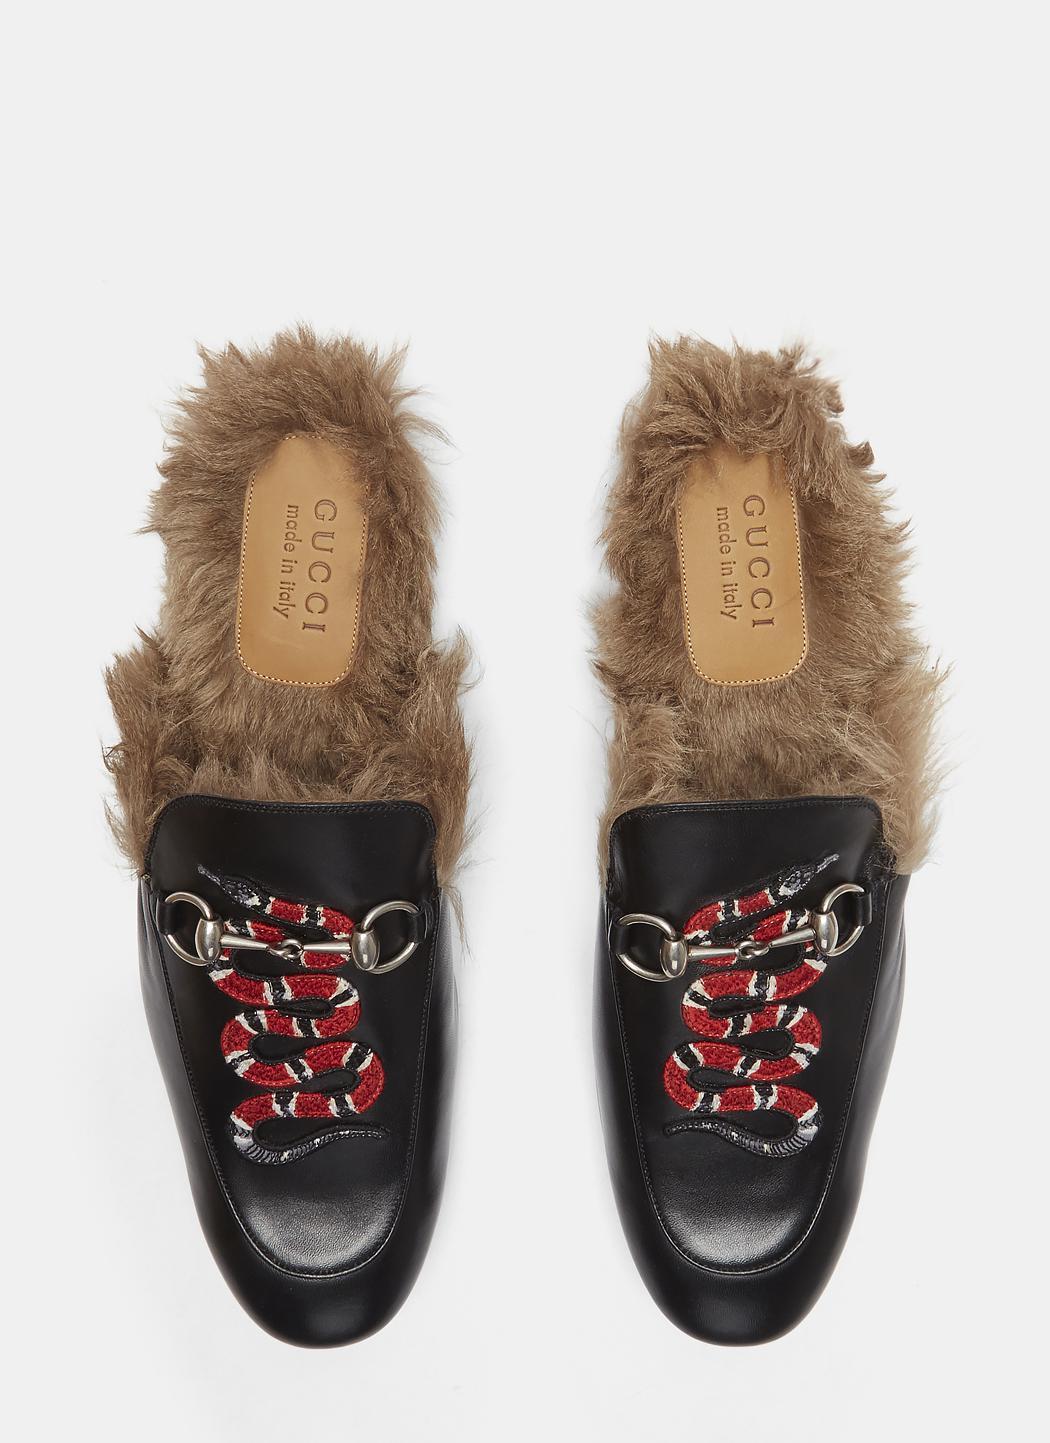 494f620ac Gucci Princetown Kingsnake Slipper Shoes In Black in Black for Men ...